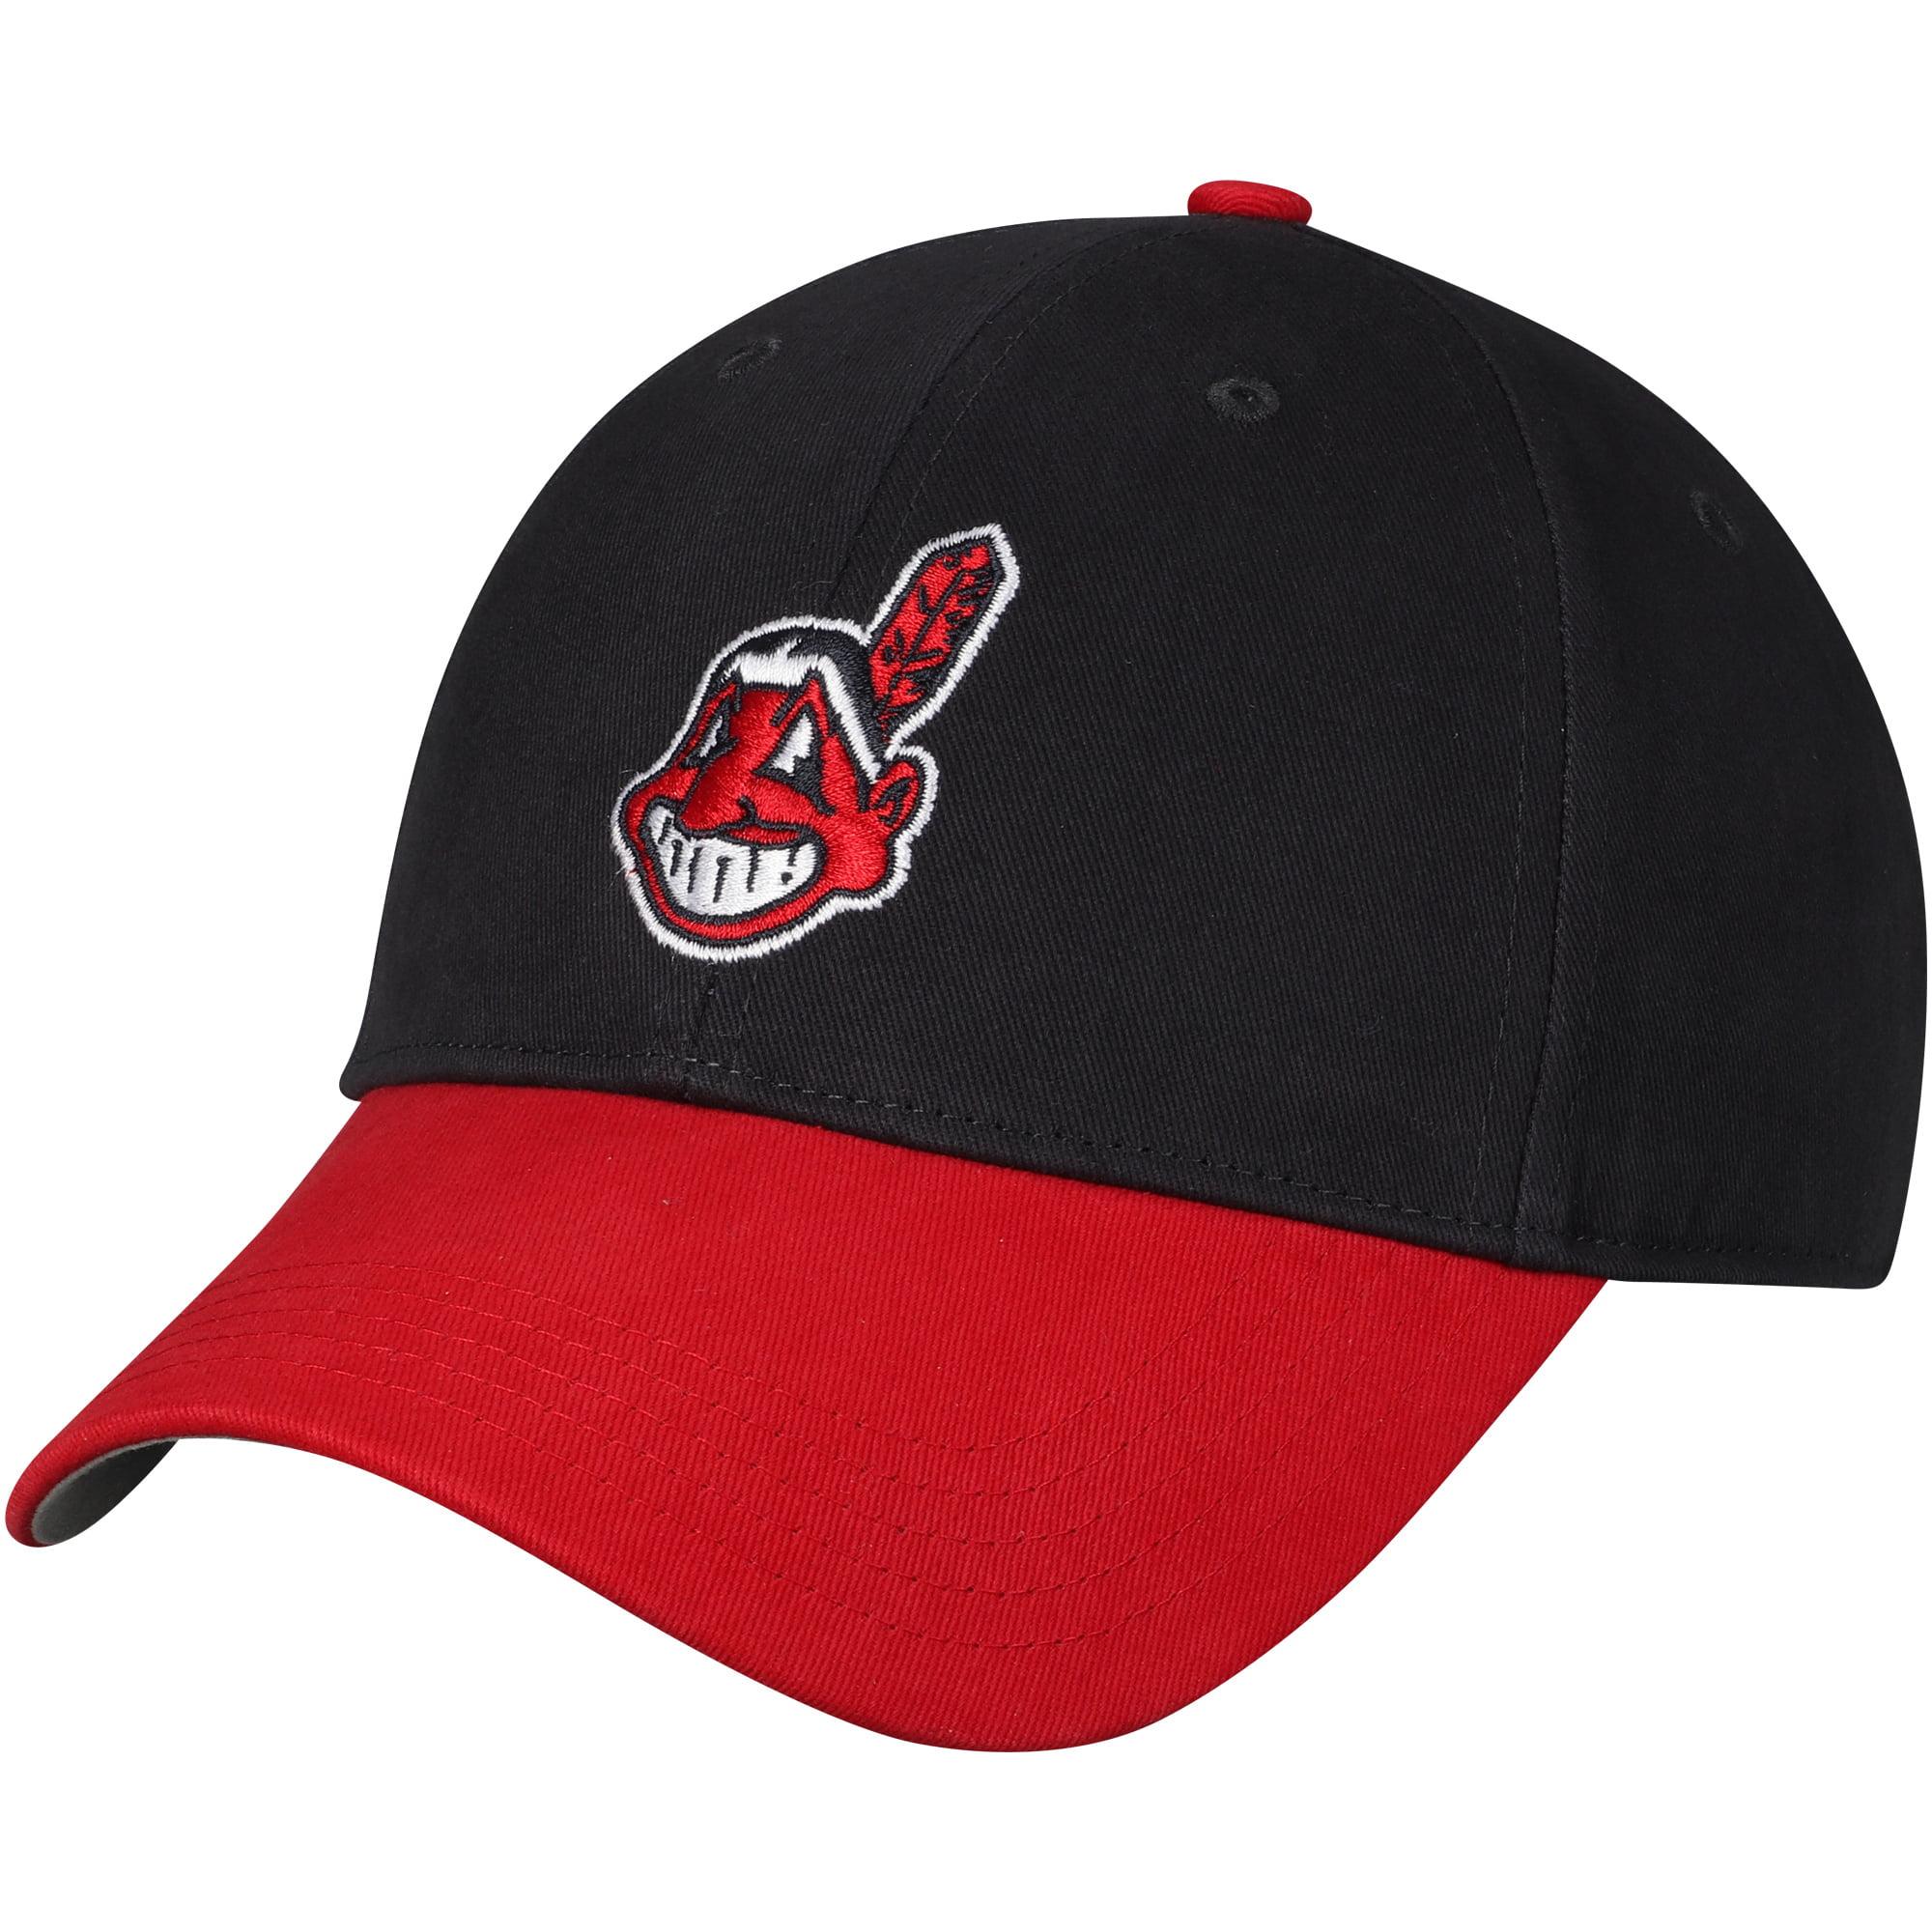 Fan Favorite Cleveland Indians '47 Youth Basic Adjustable Hat - Navy - OSFA